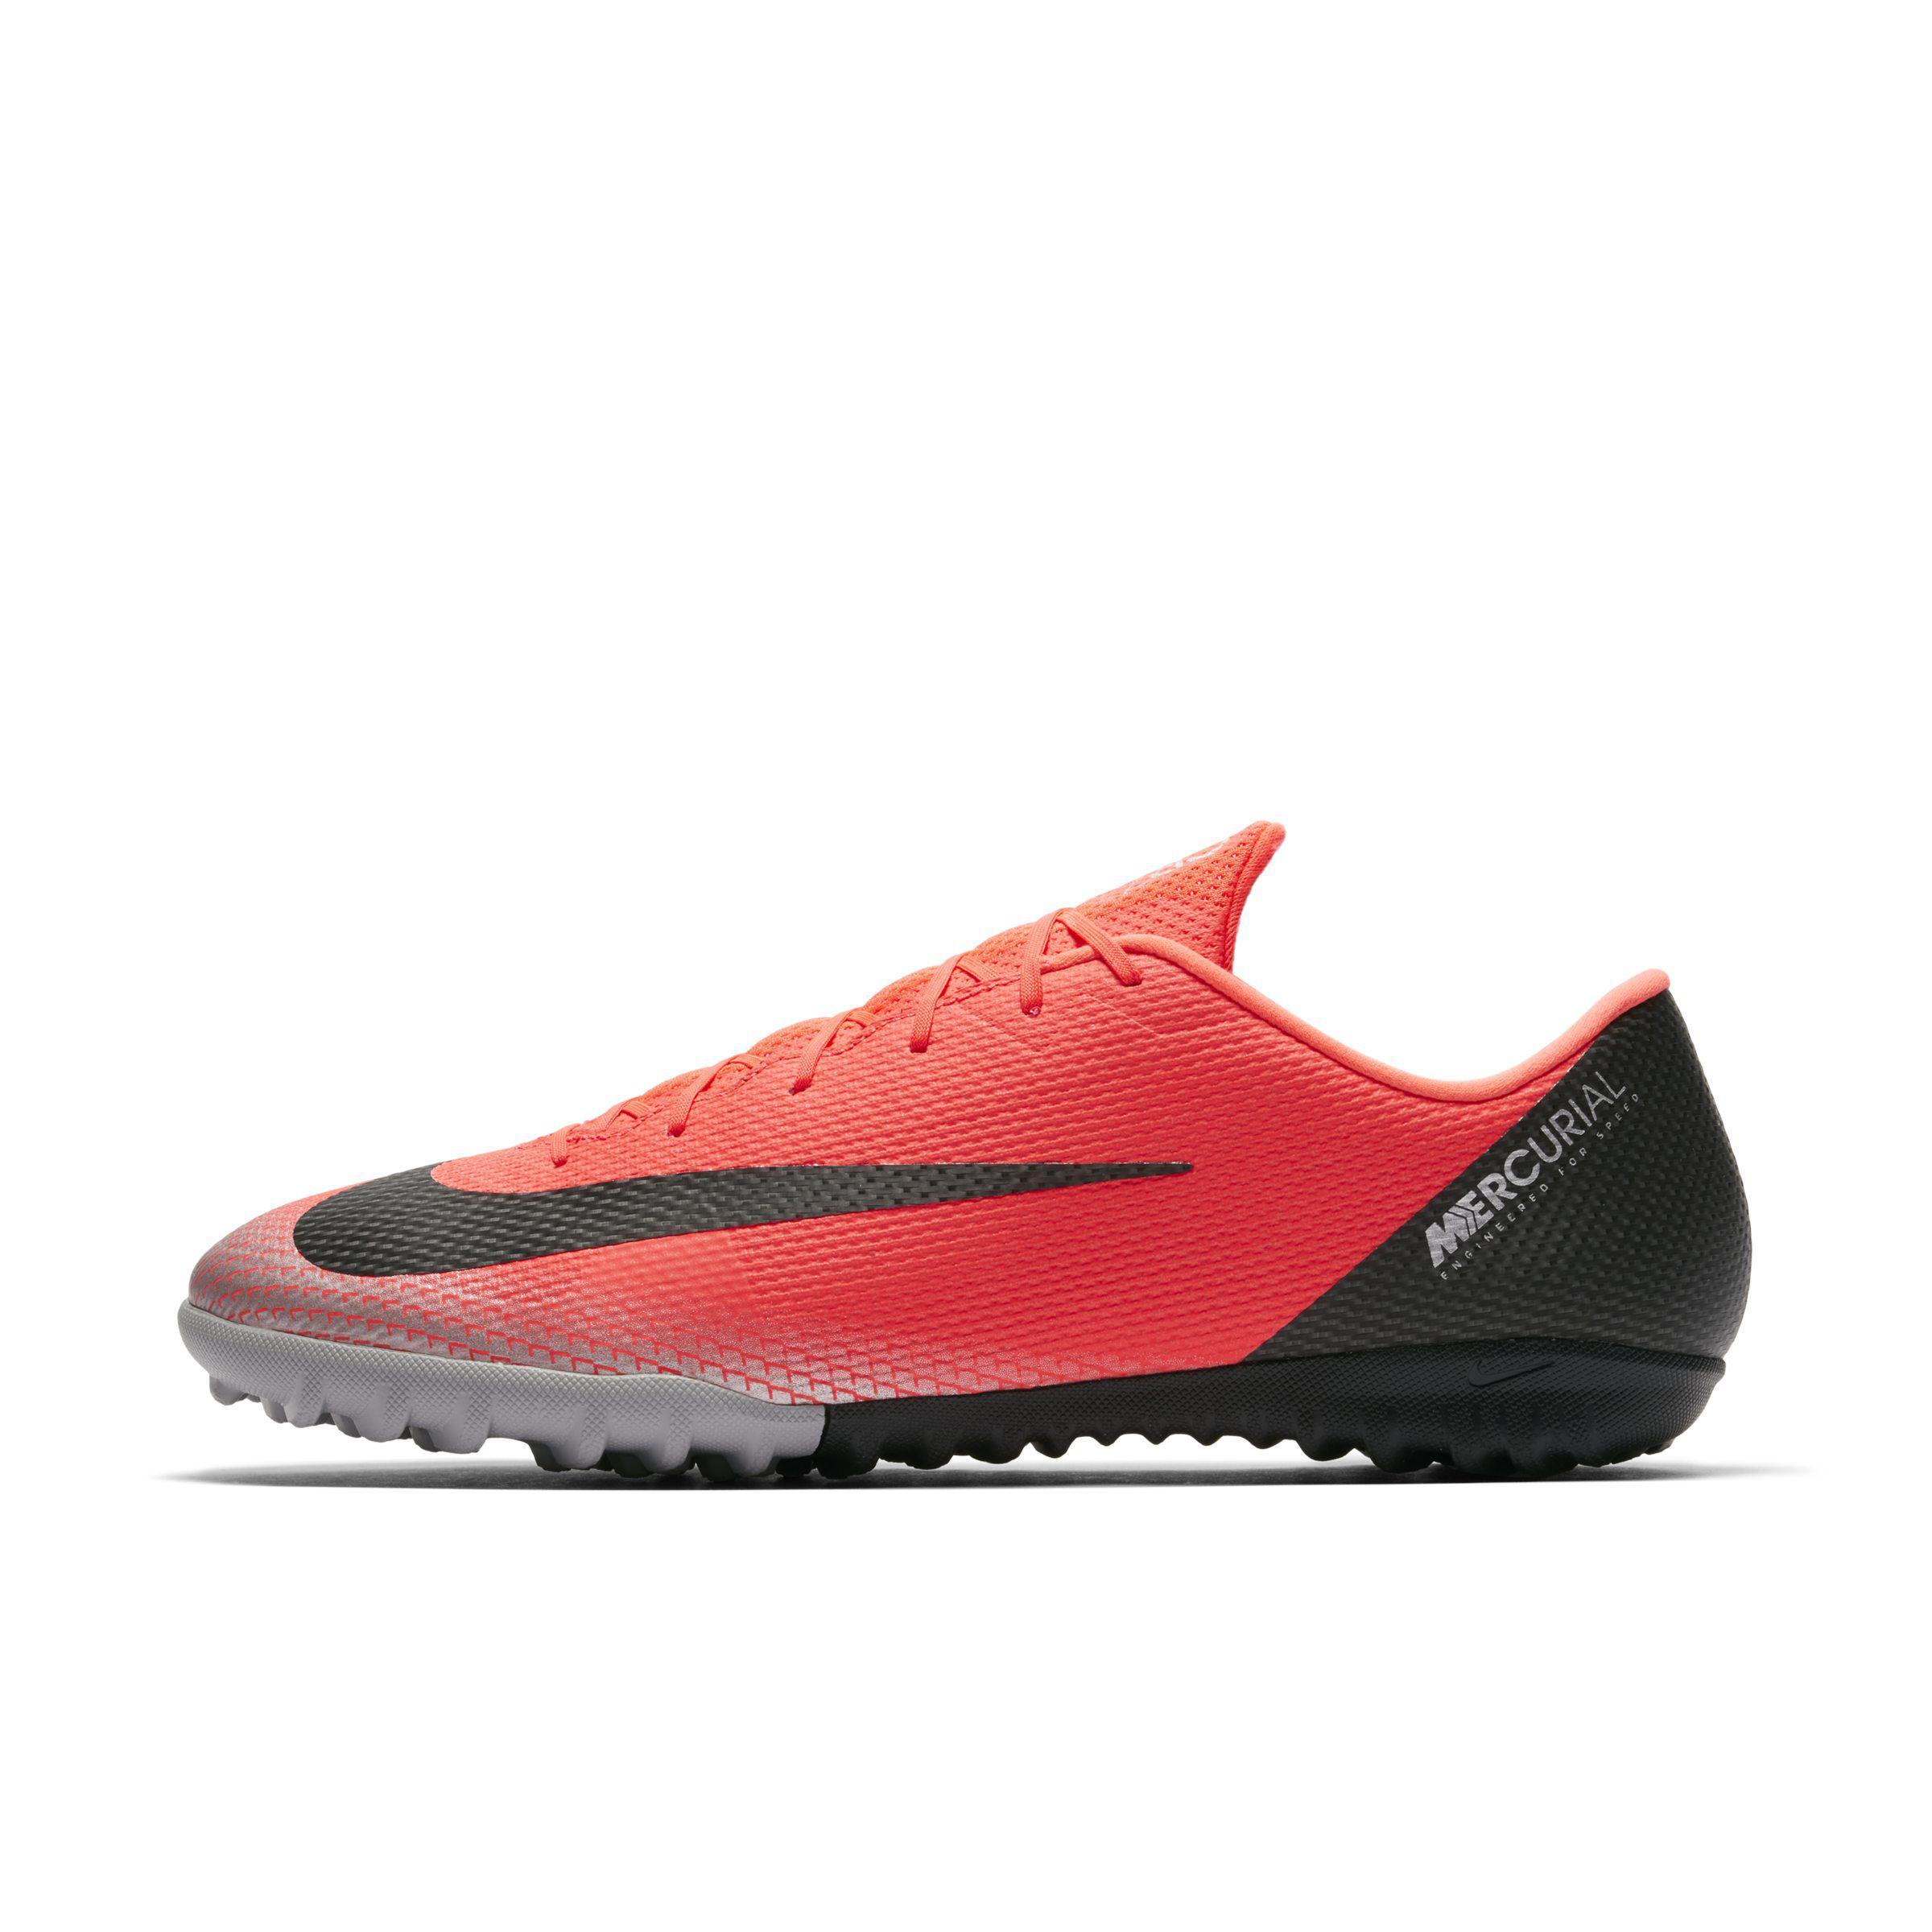 5053ca556 Nike Mercurialx Vapor Xii Academy Cr7 Turf Football Shoe in Red - Lyst